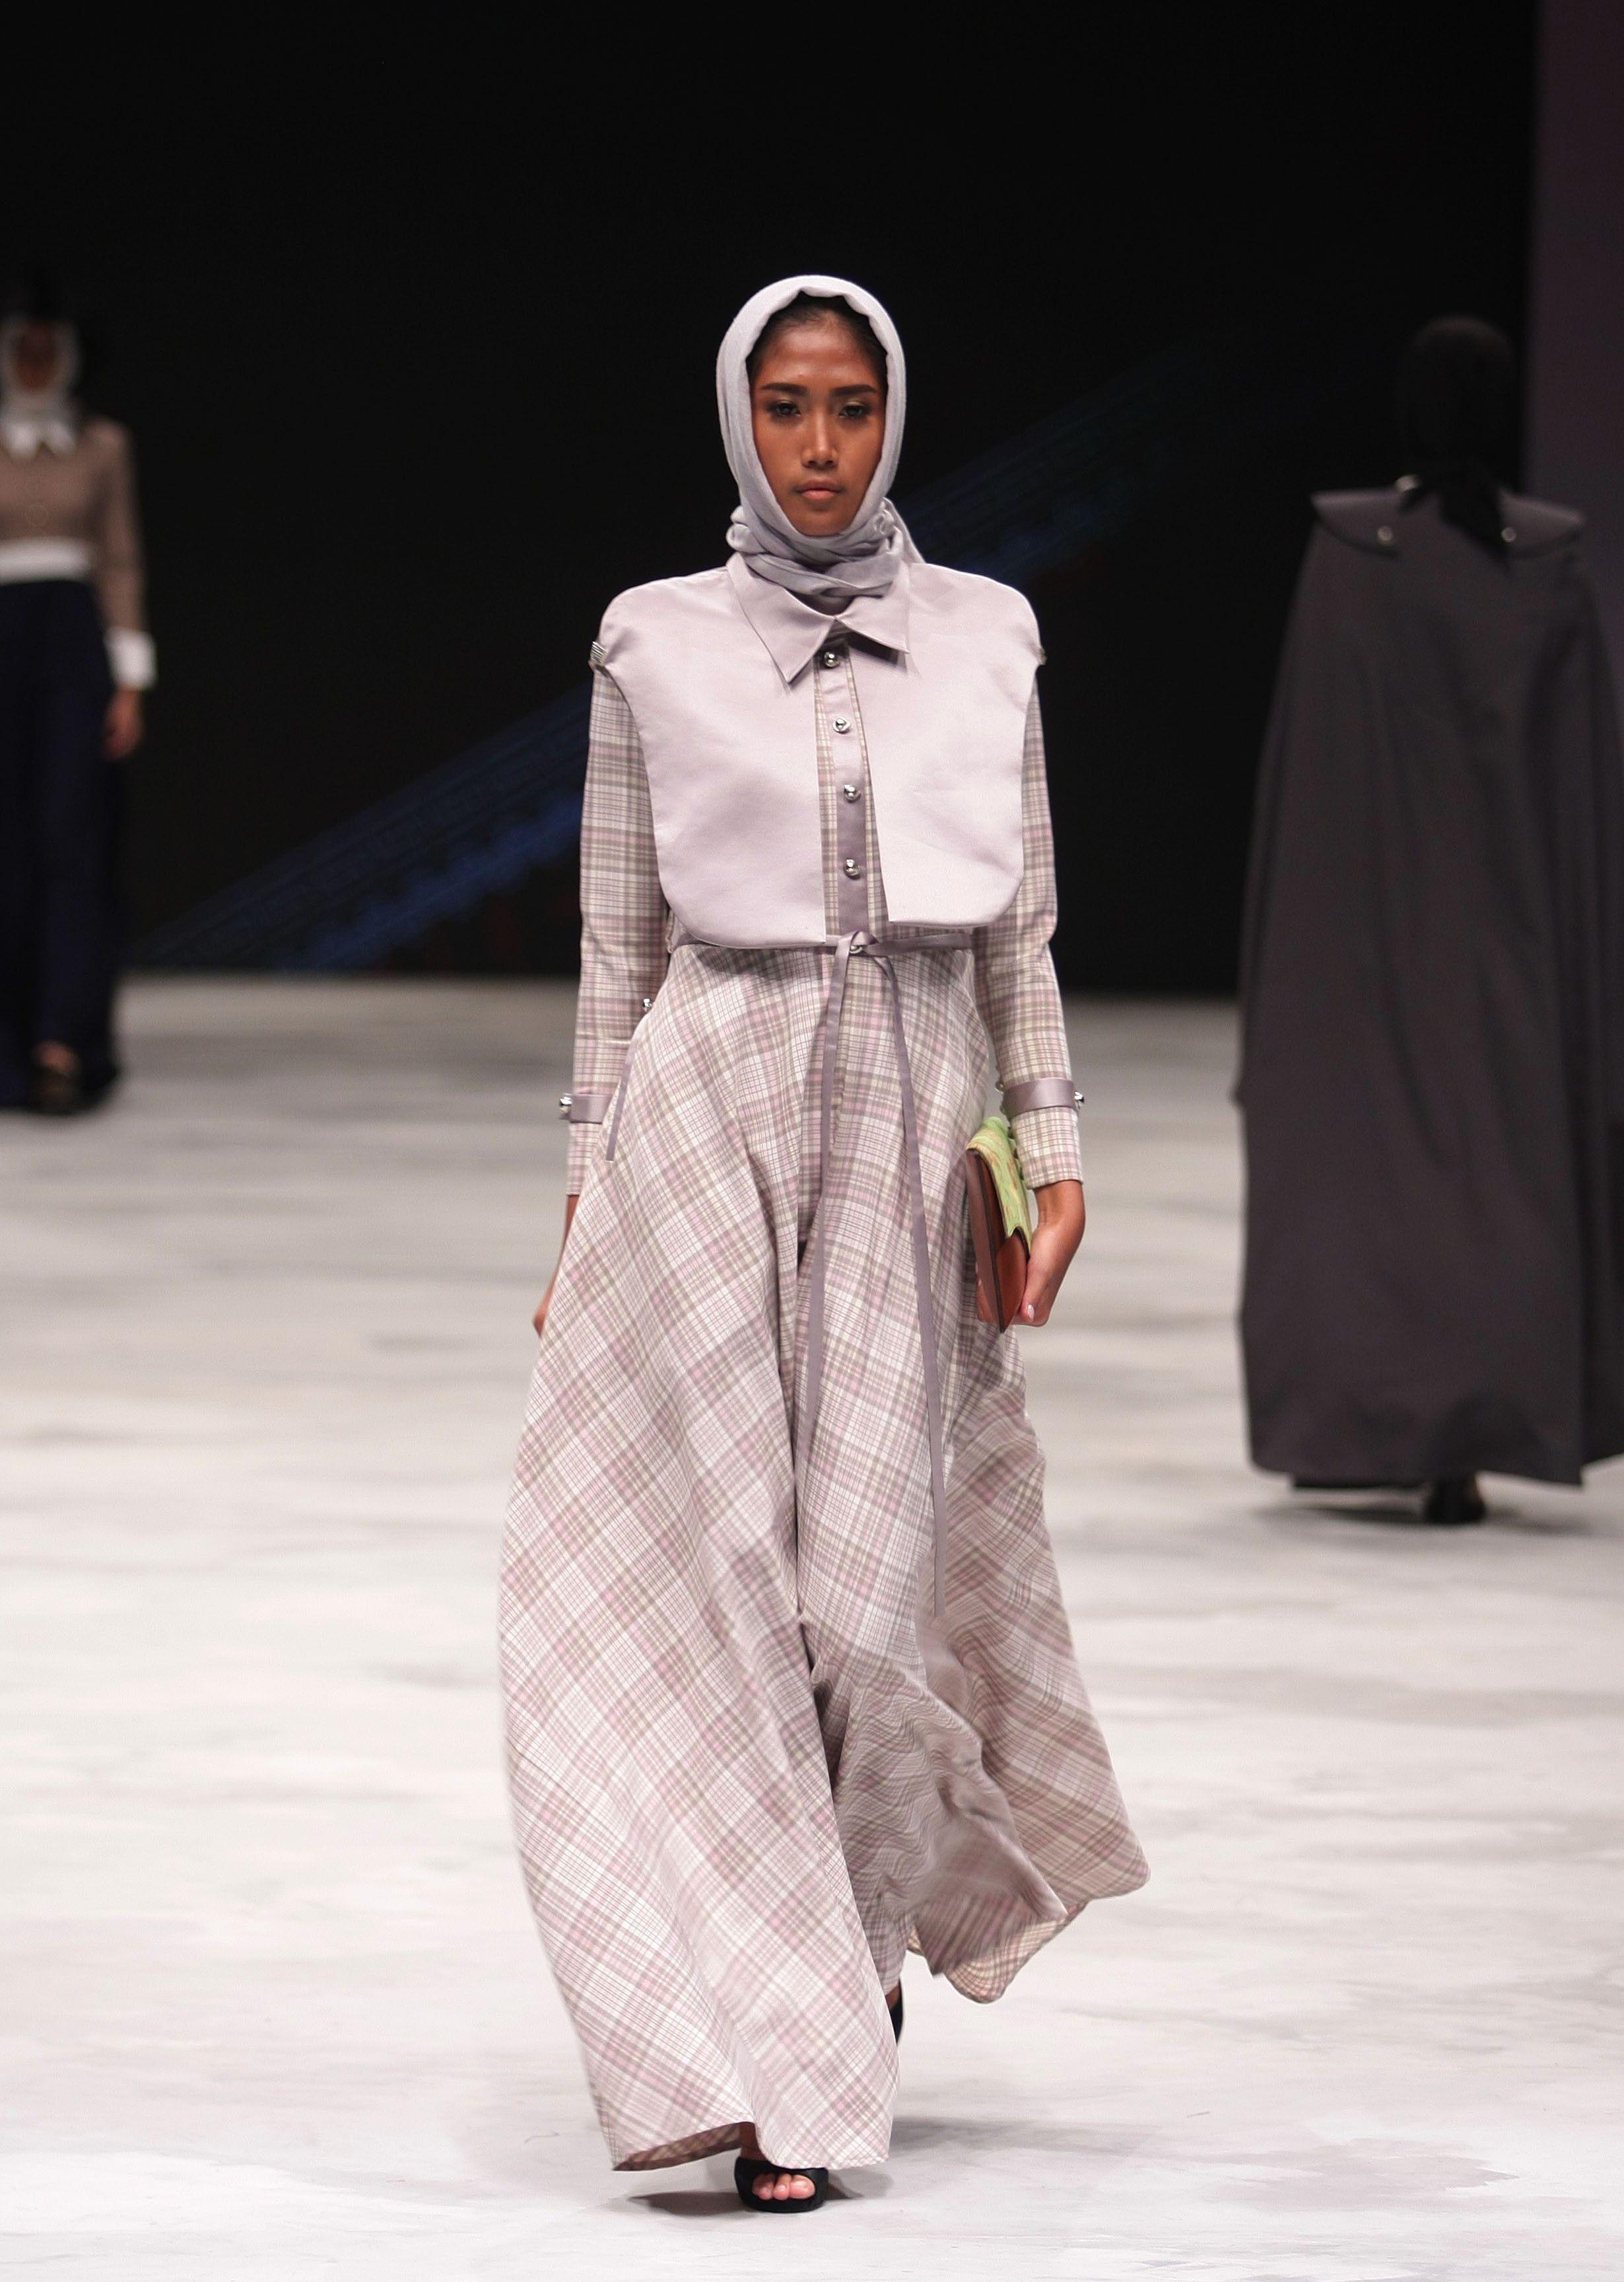 Model Baju Gamis Rancangan Zaskia Sungkar  Model, Gaya busana